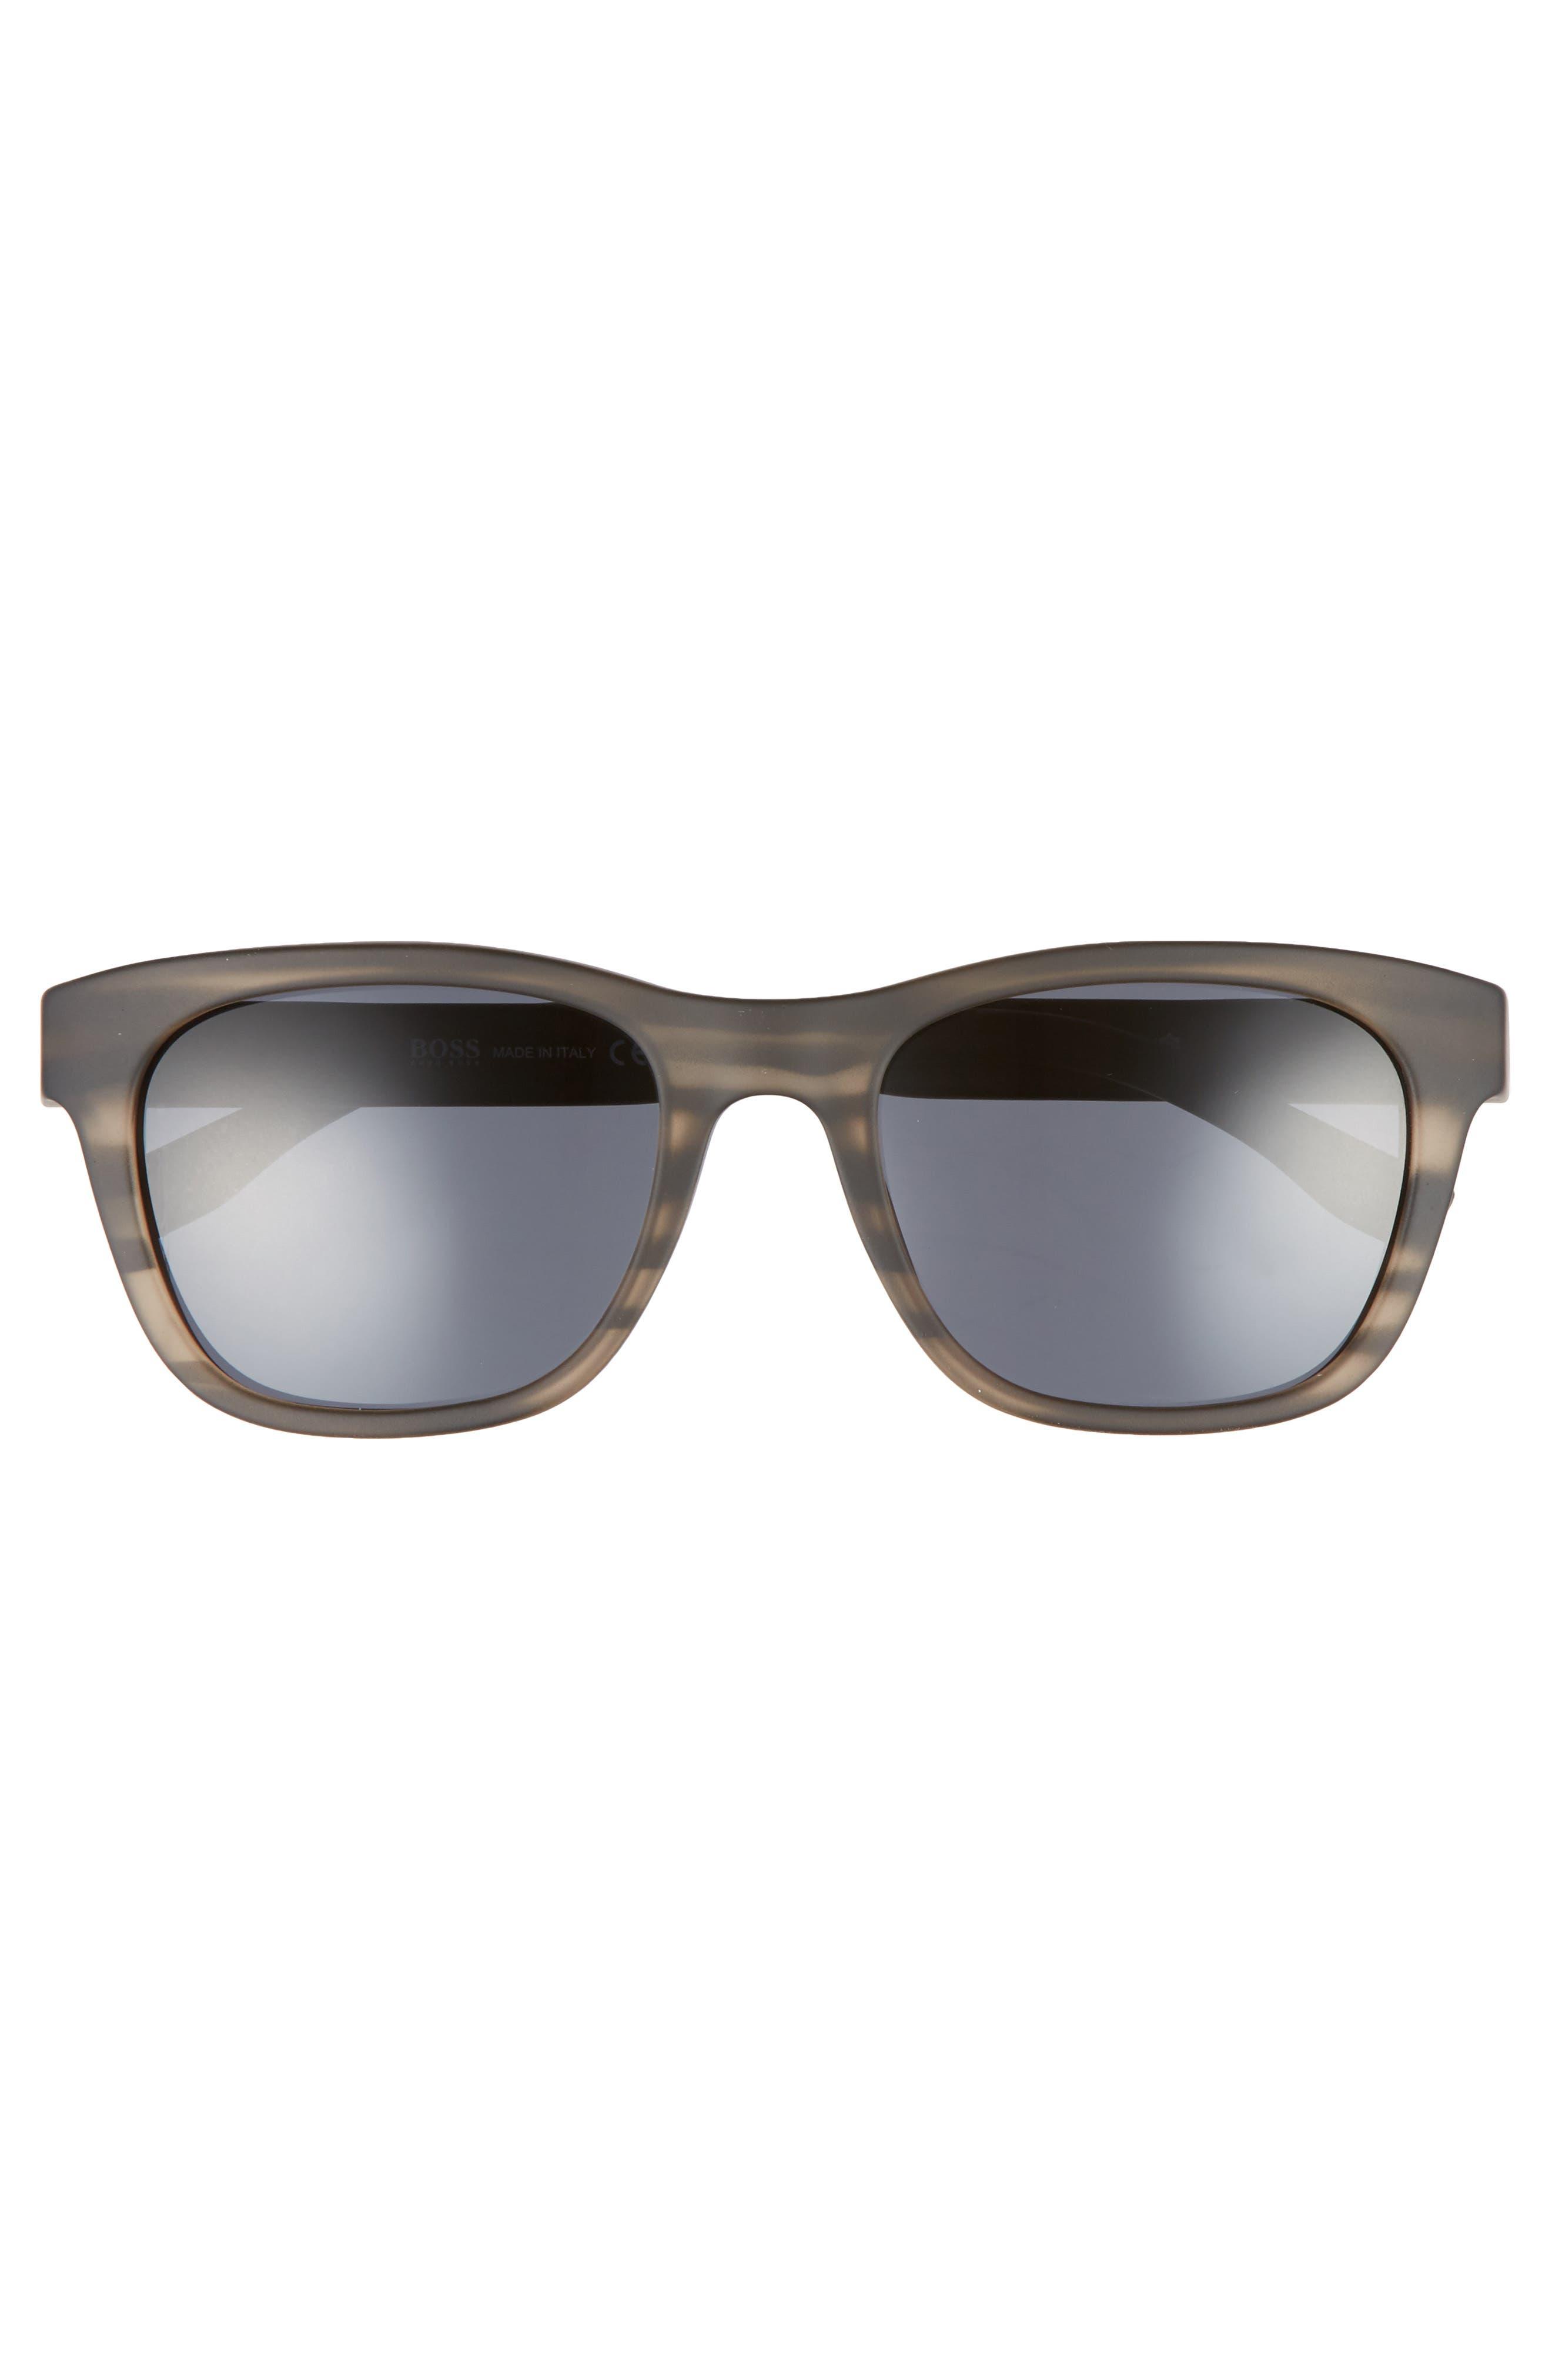 53mm Polarized Sunglasses,                             Alternate thumbnail 2, color,                             Gray Horn Black/ Gray Blue